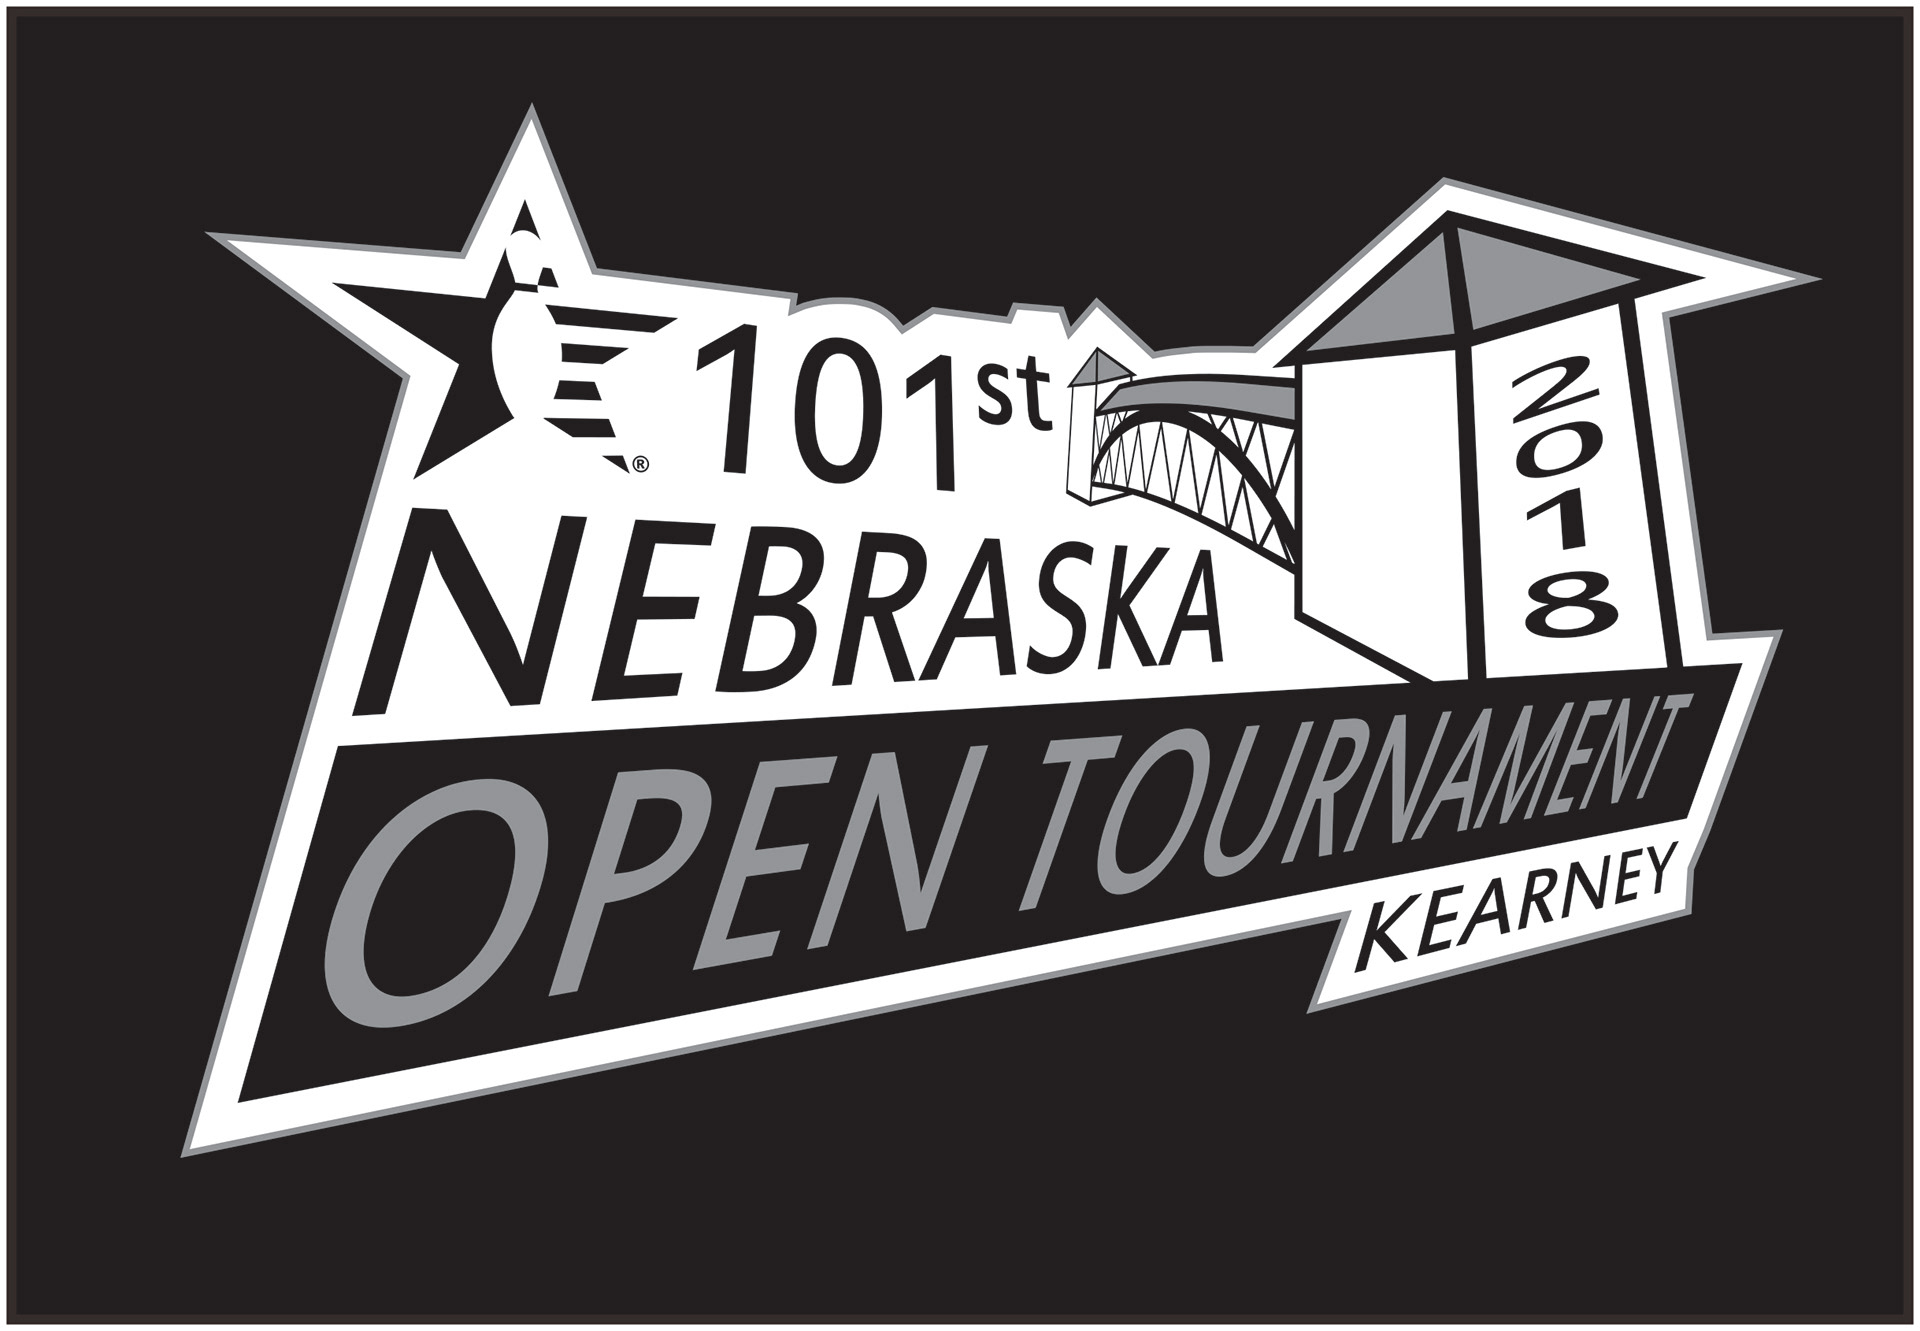 Eric Behrendt Portfolio Nebraska Usbc 101st Open Tournament Logo